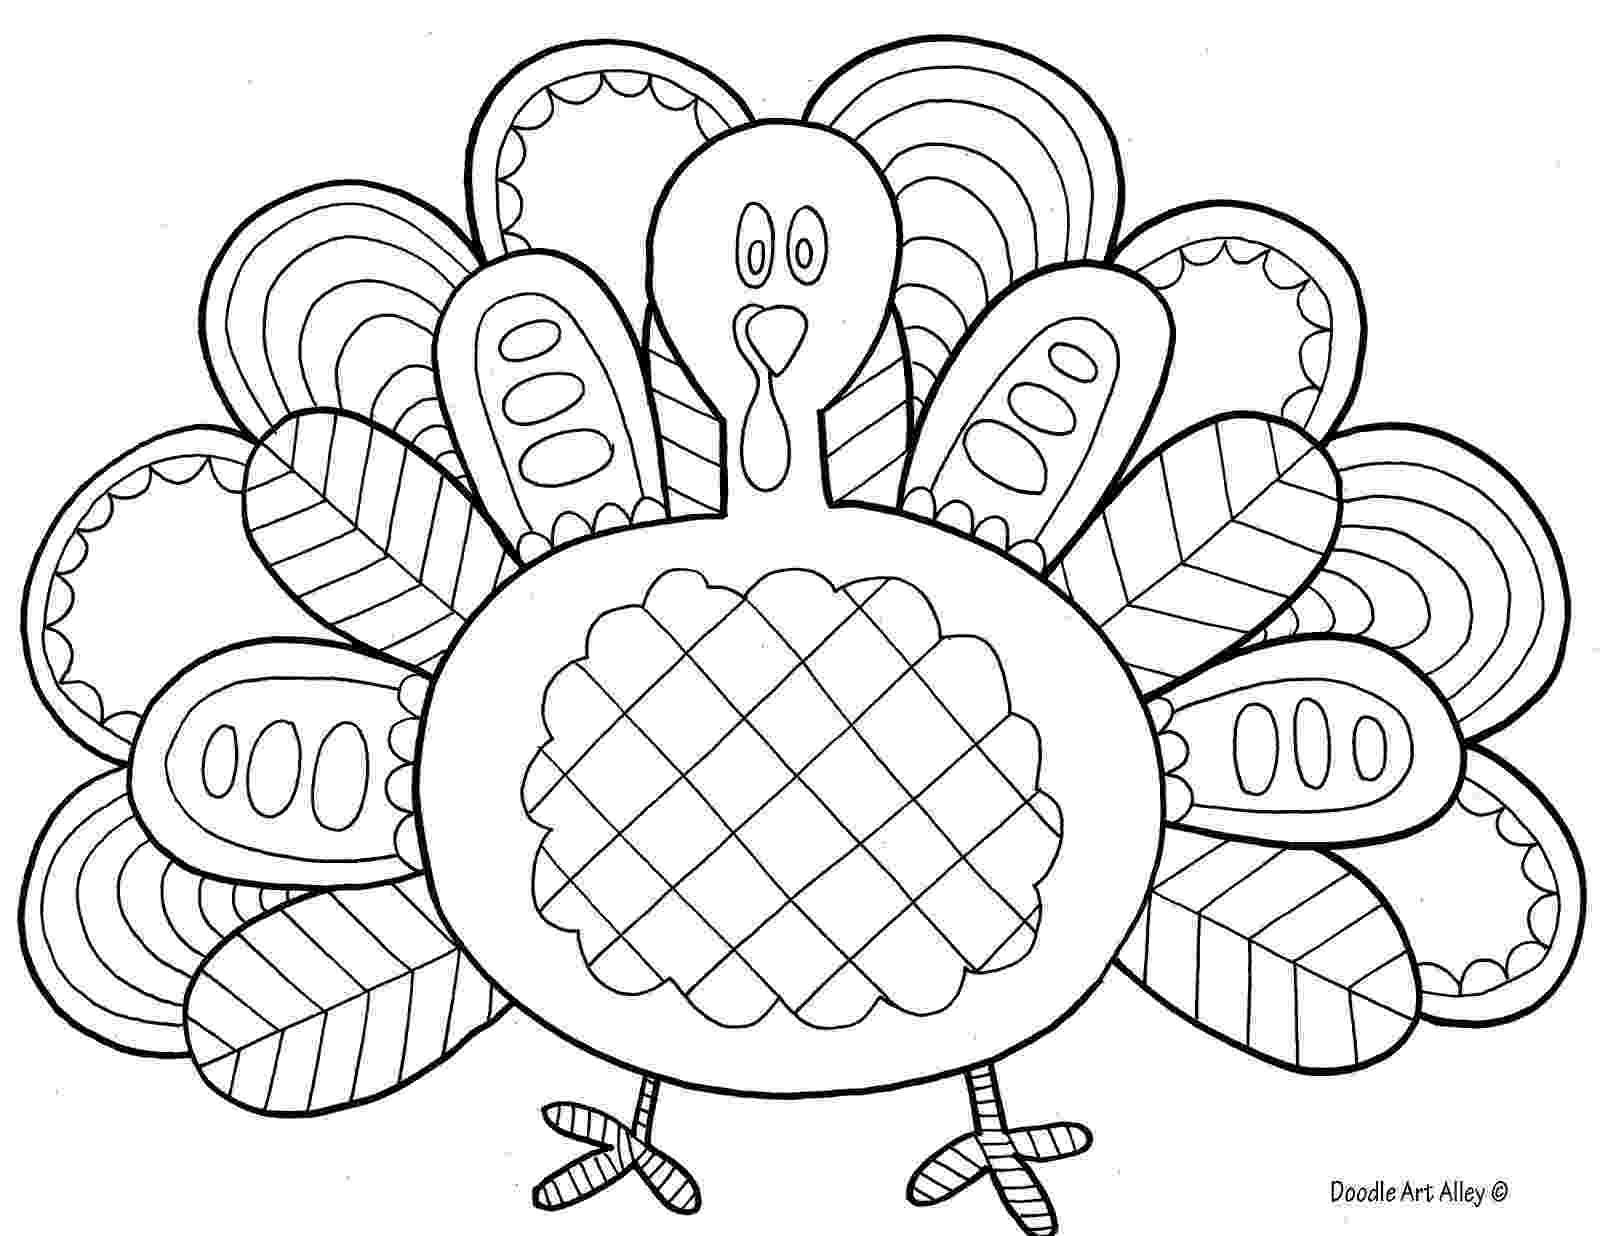 turkey coloring sheet simblissity november 2012 turkey coloring sheet